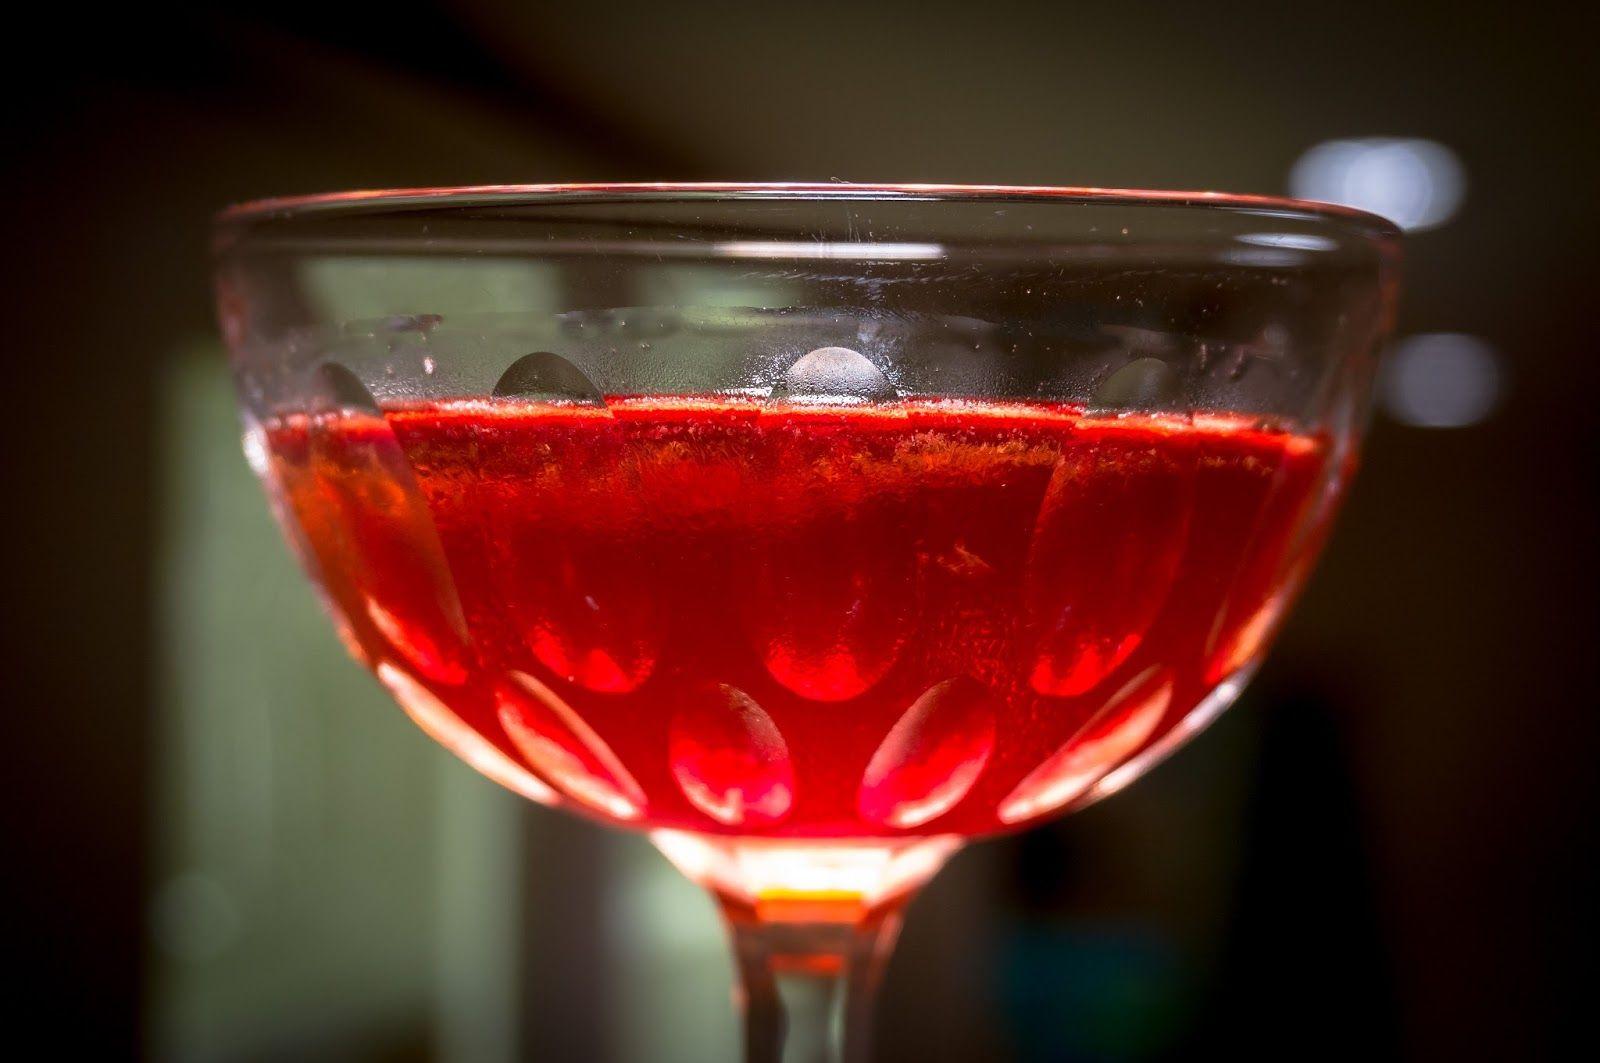 The Sunday Cocktail Cherry Bakewell1 Shot Aged Rum 1 Shot Amaretto 1 Shot Cherry Brandy 1 Bar Spoon Lime Juice 1 Bar Cherry Bakewell Gin Recipes Cherry Brandy